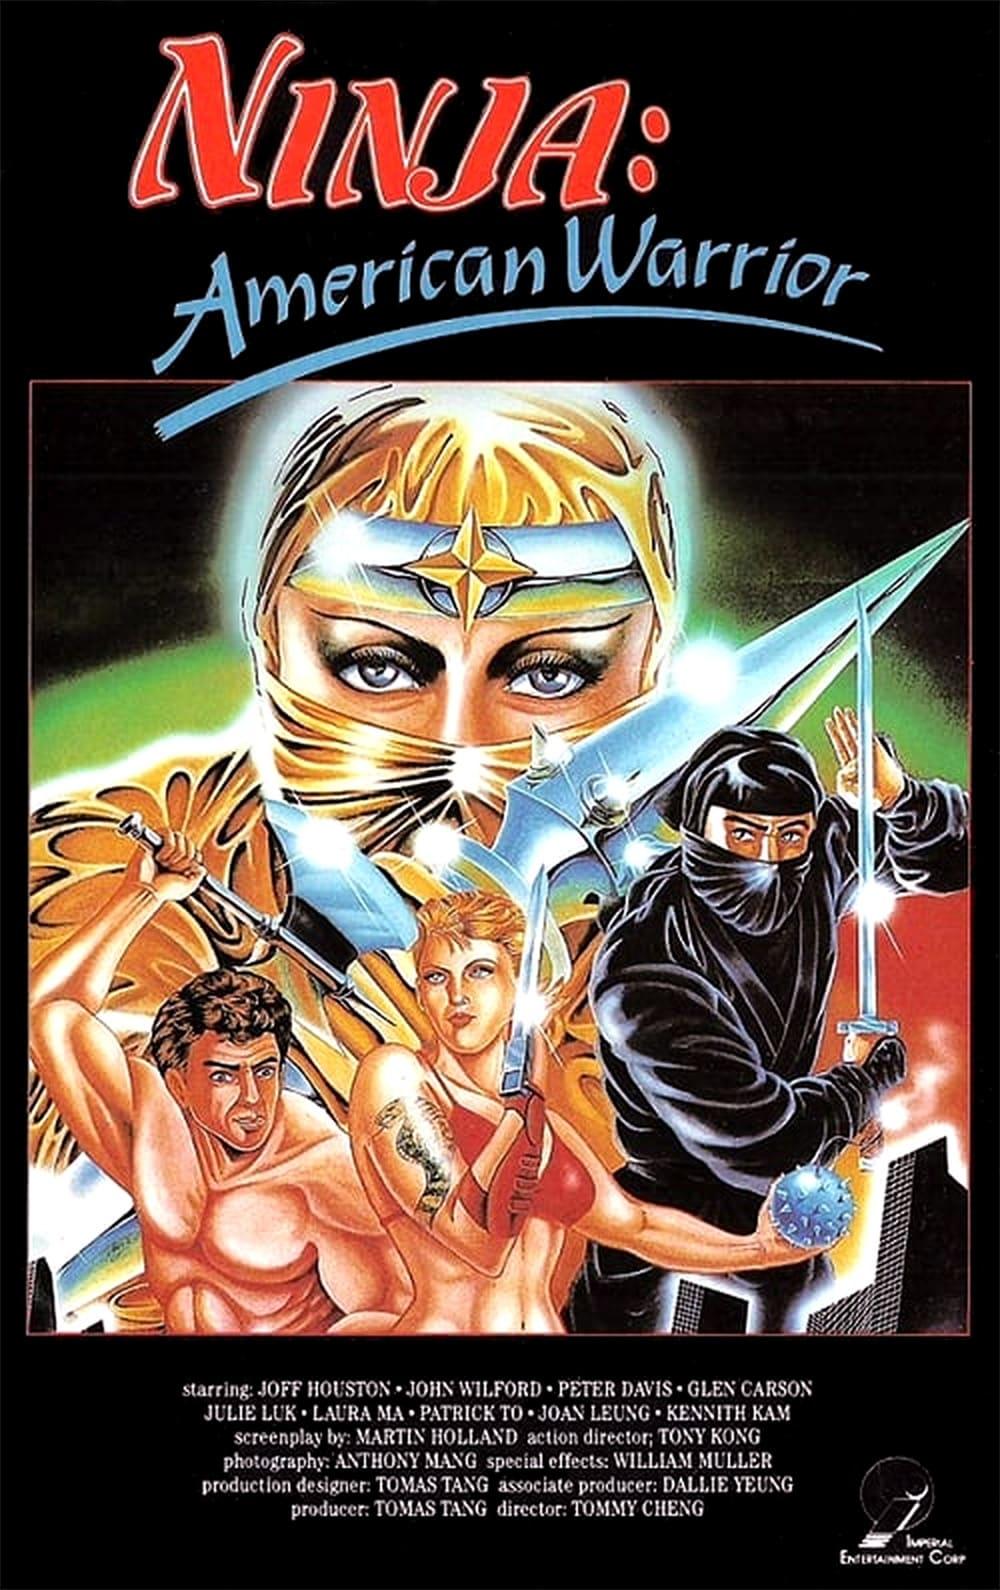 Ninja: American Warrior